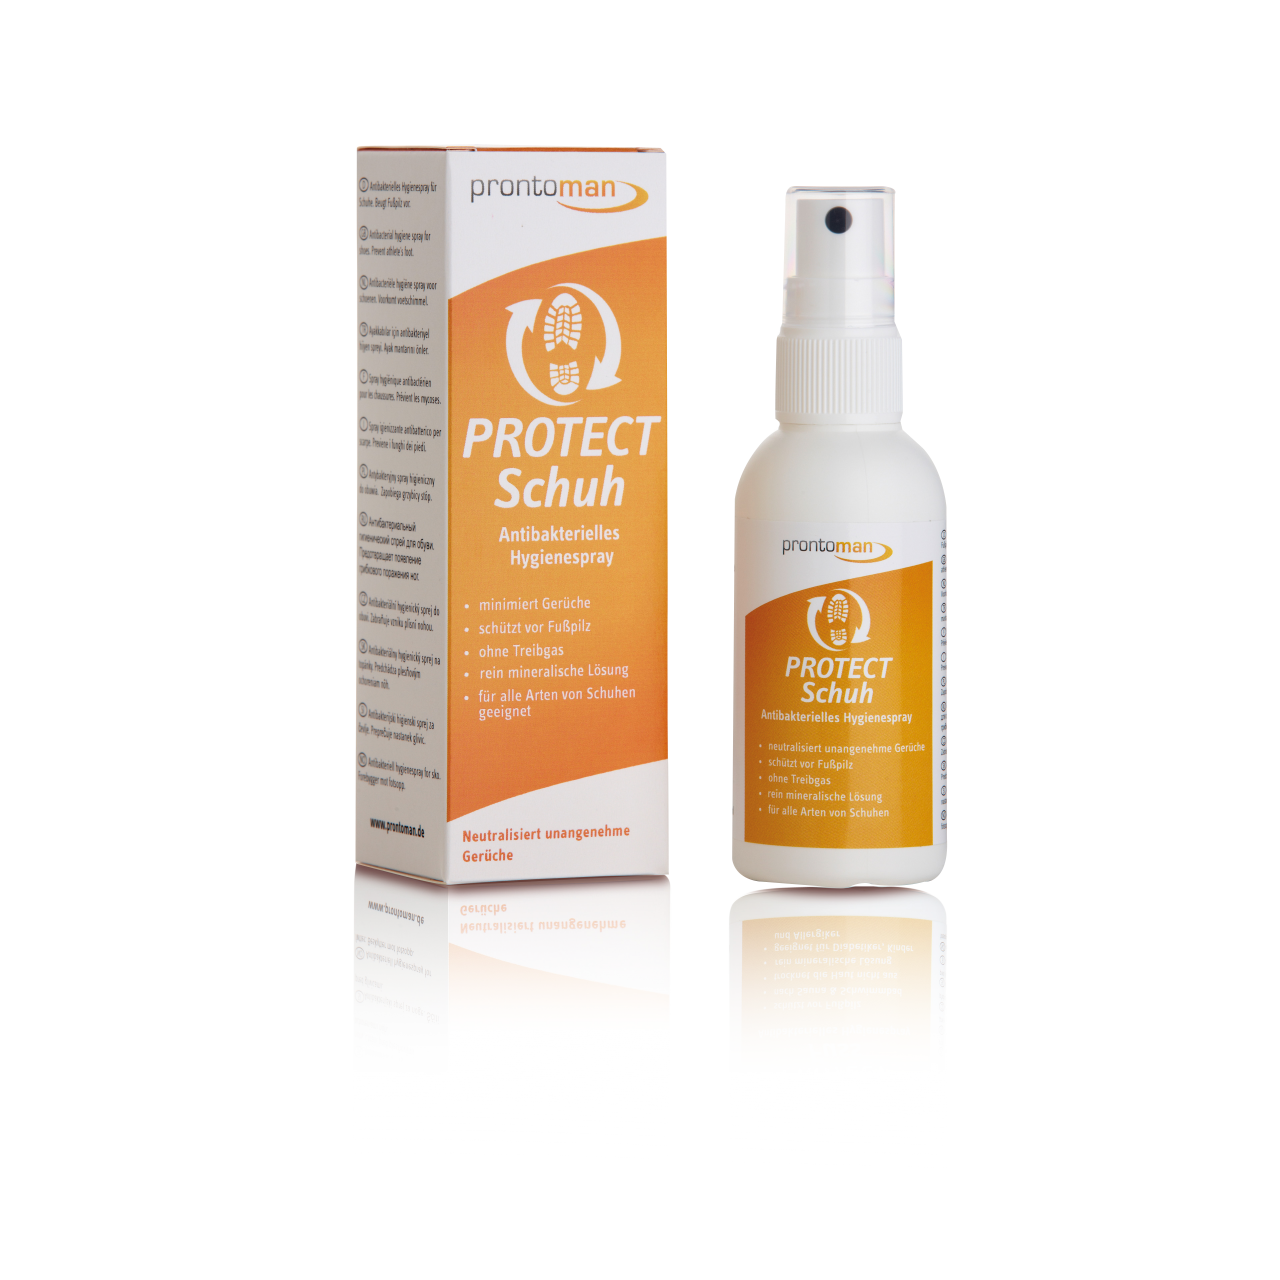 Prontoman PROTECT Schuh 75 ml